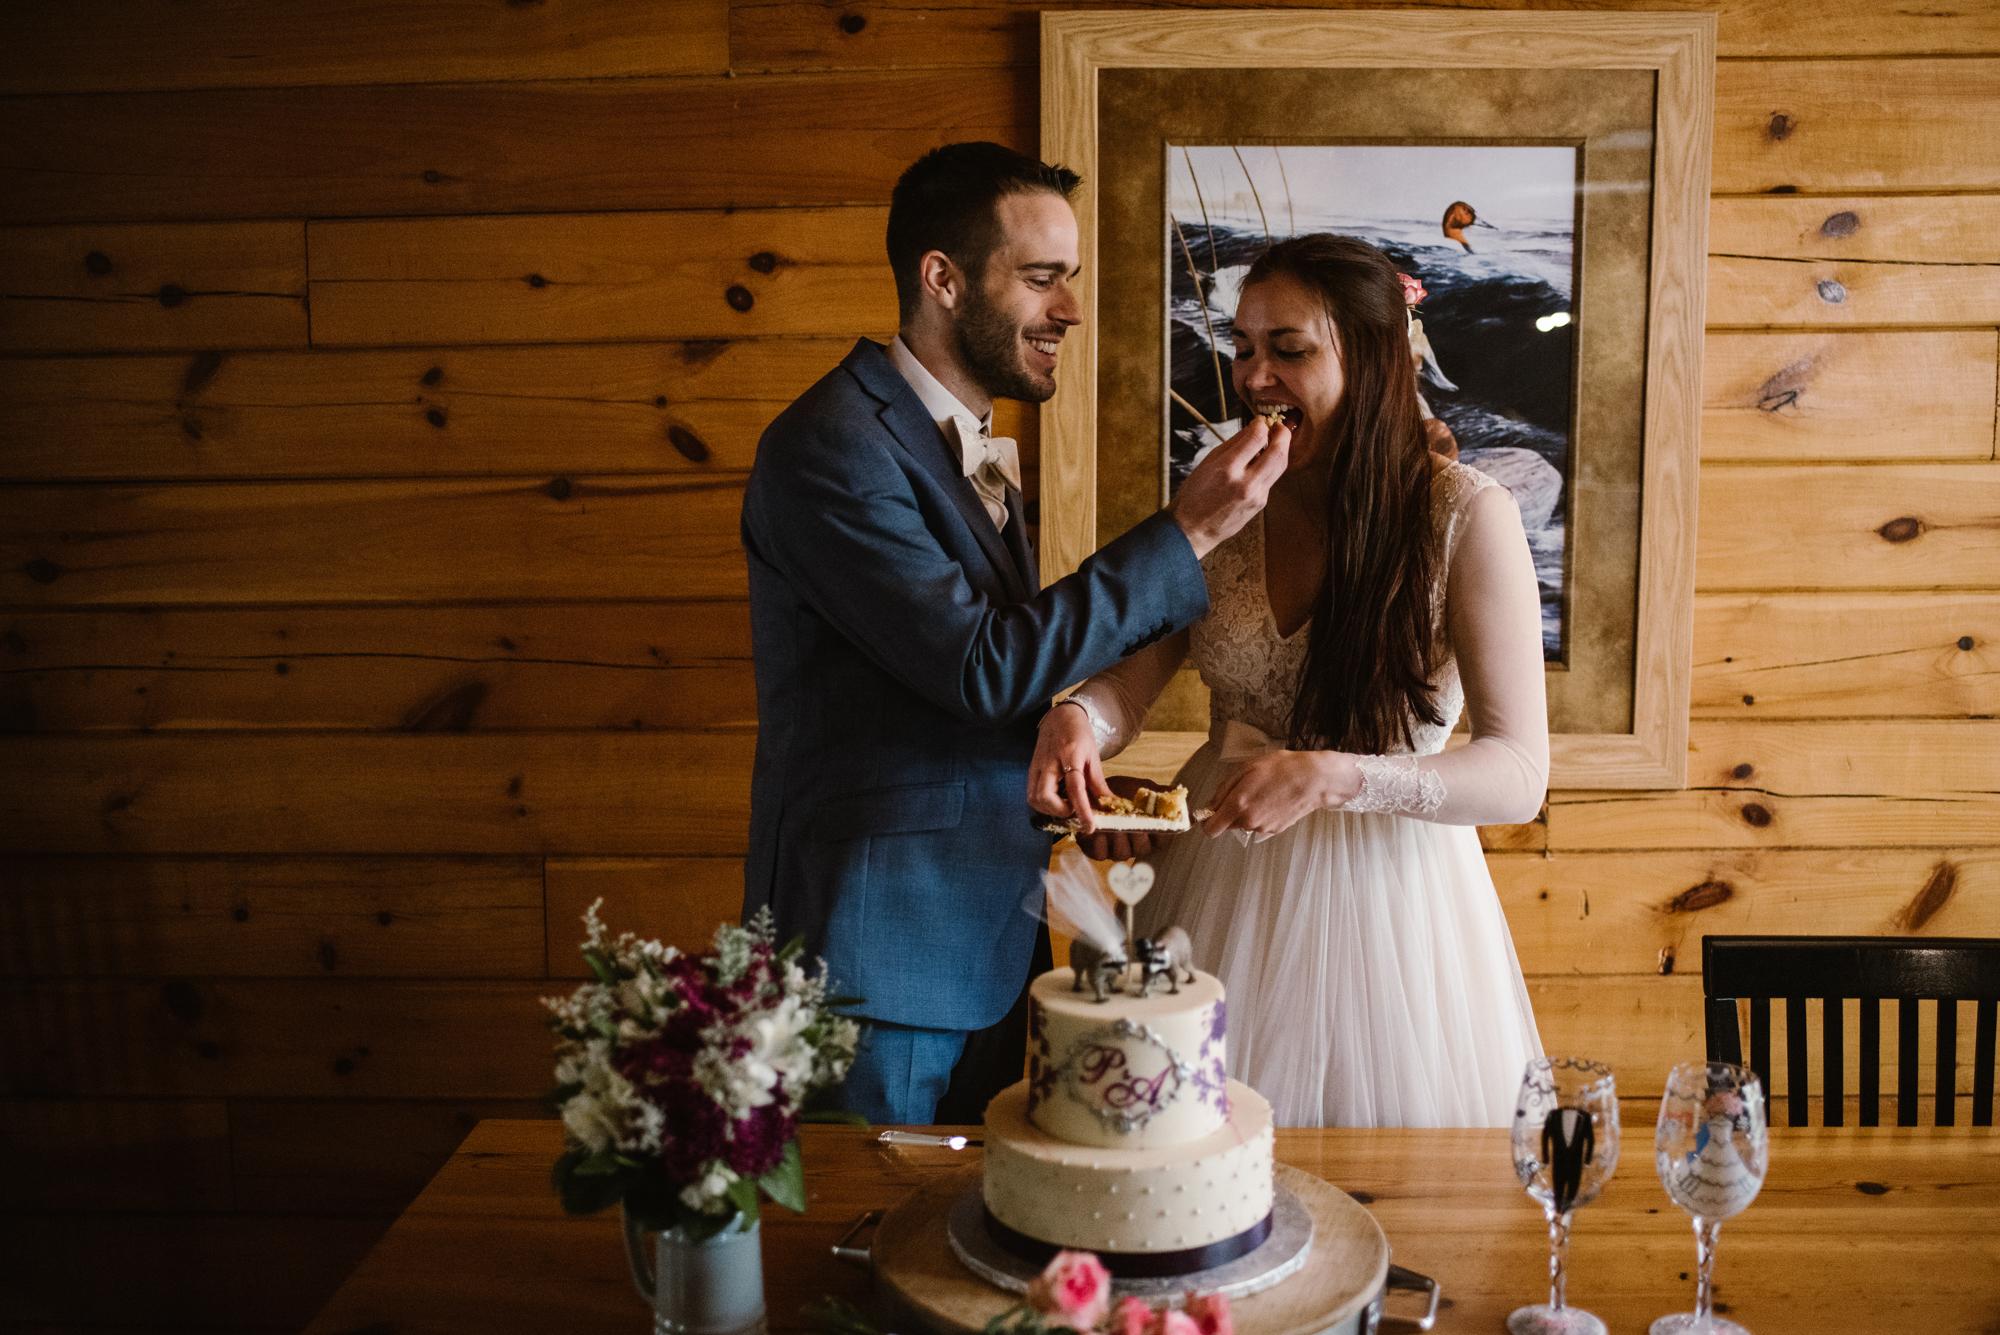 Paula and Andrew - Small Adventurous Wedding in Shenandoah National Park - Blue Ridge Mountain Wedding - White Sails Creative - Mountain Elopement_58.jpg